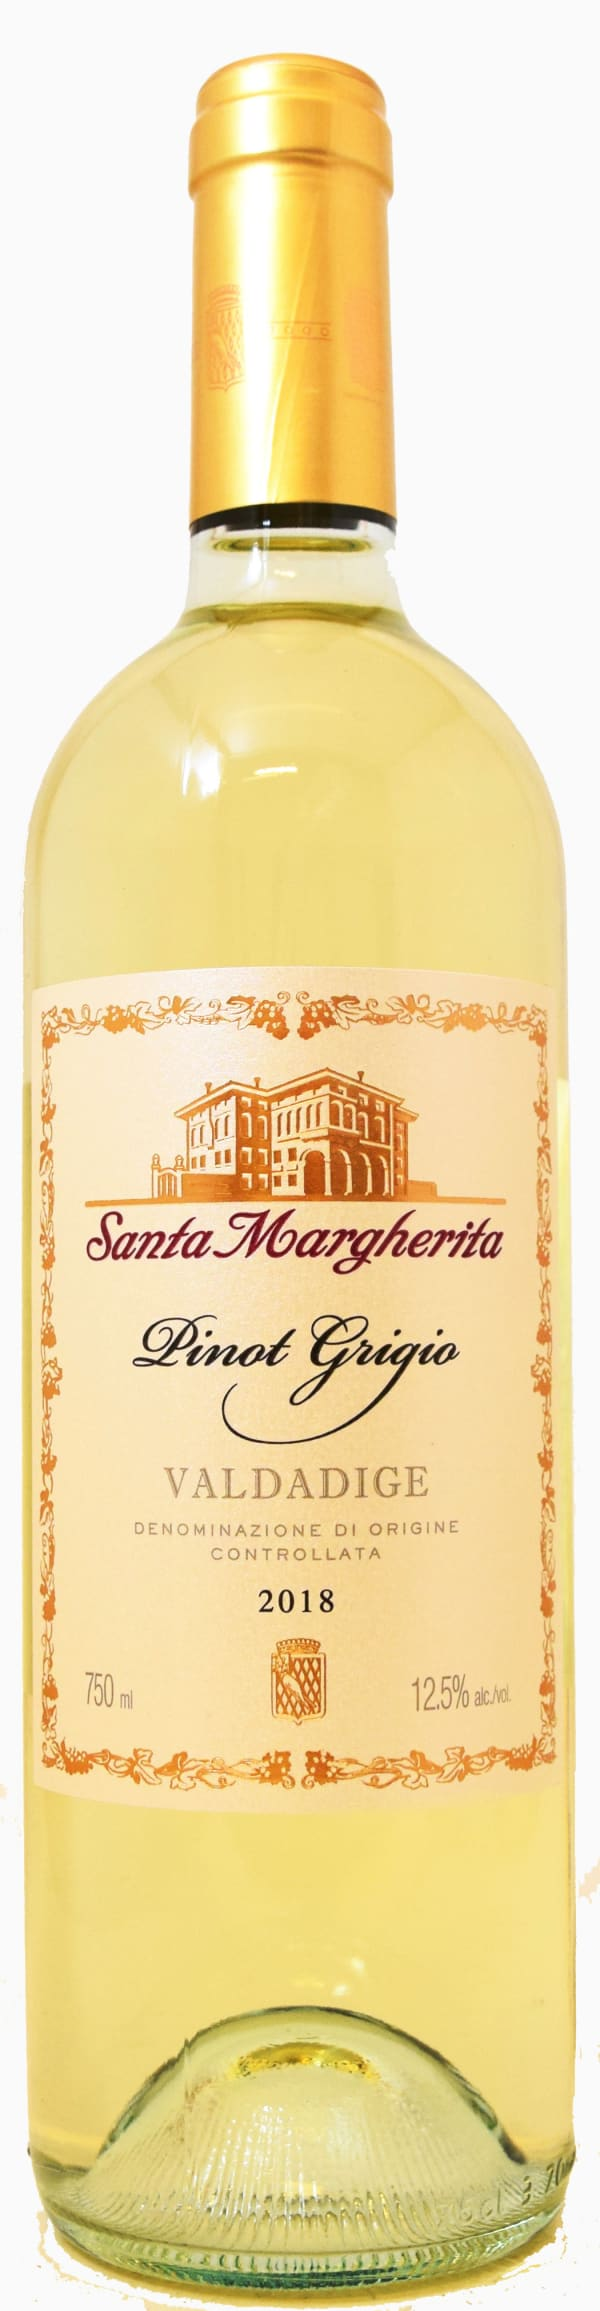 Santa Margherita Pinot Grigio 2019